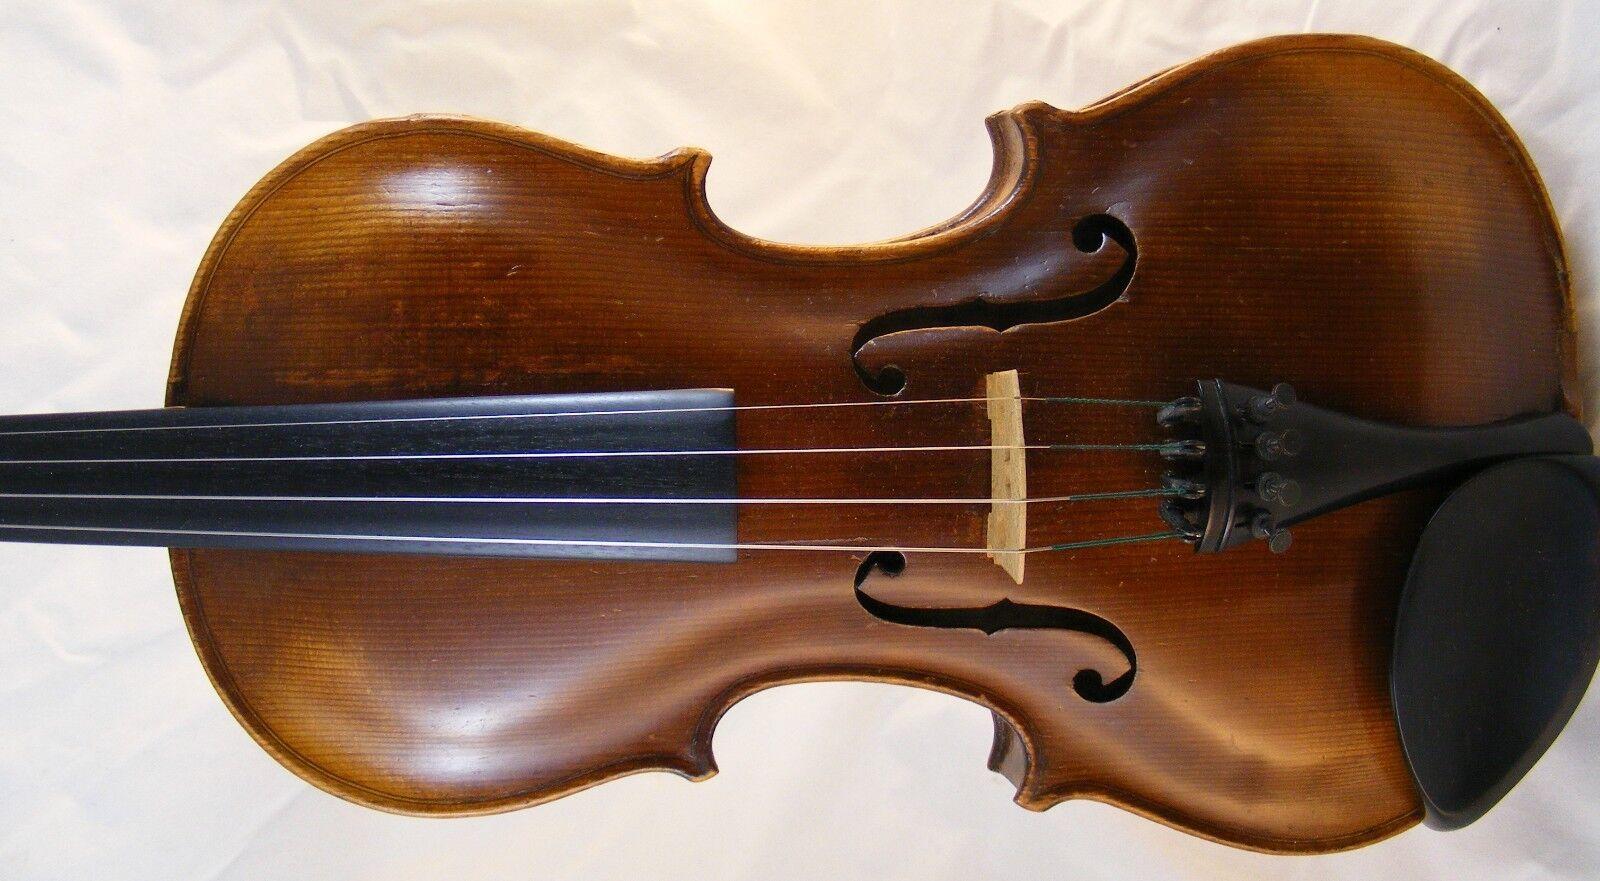 Vintage 4 4 Violin - Stainer Model - Handmade Handmade Handmade Fiddle - Includes Case e0b4c6